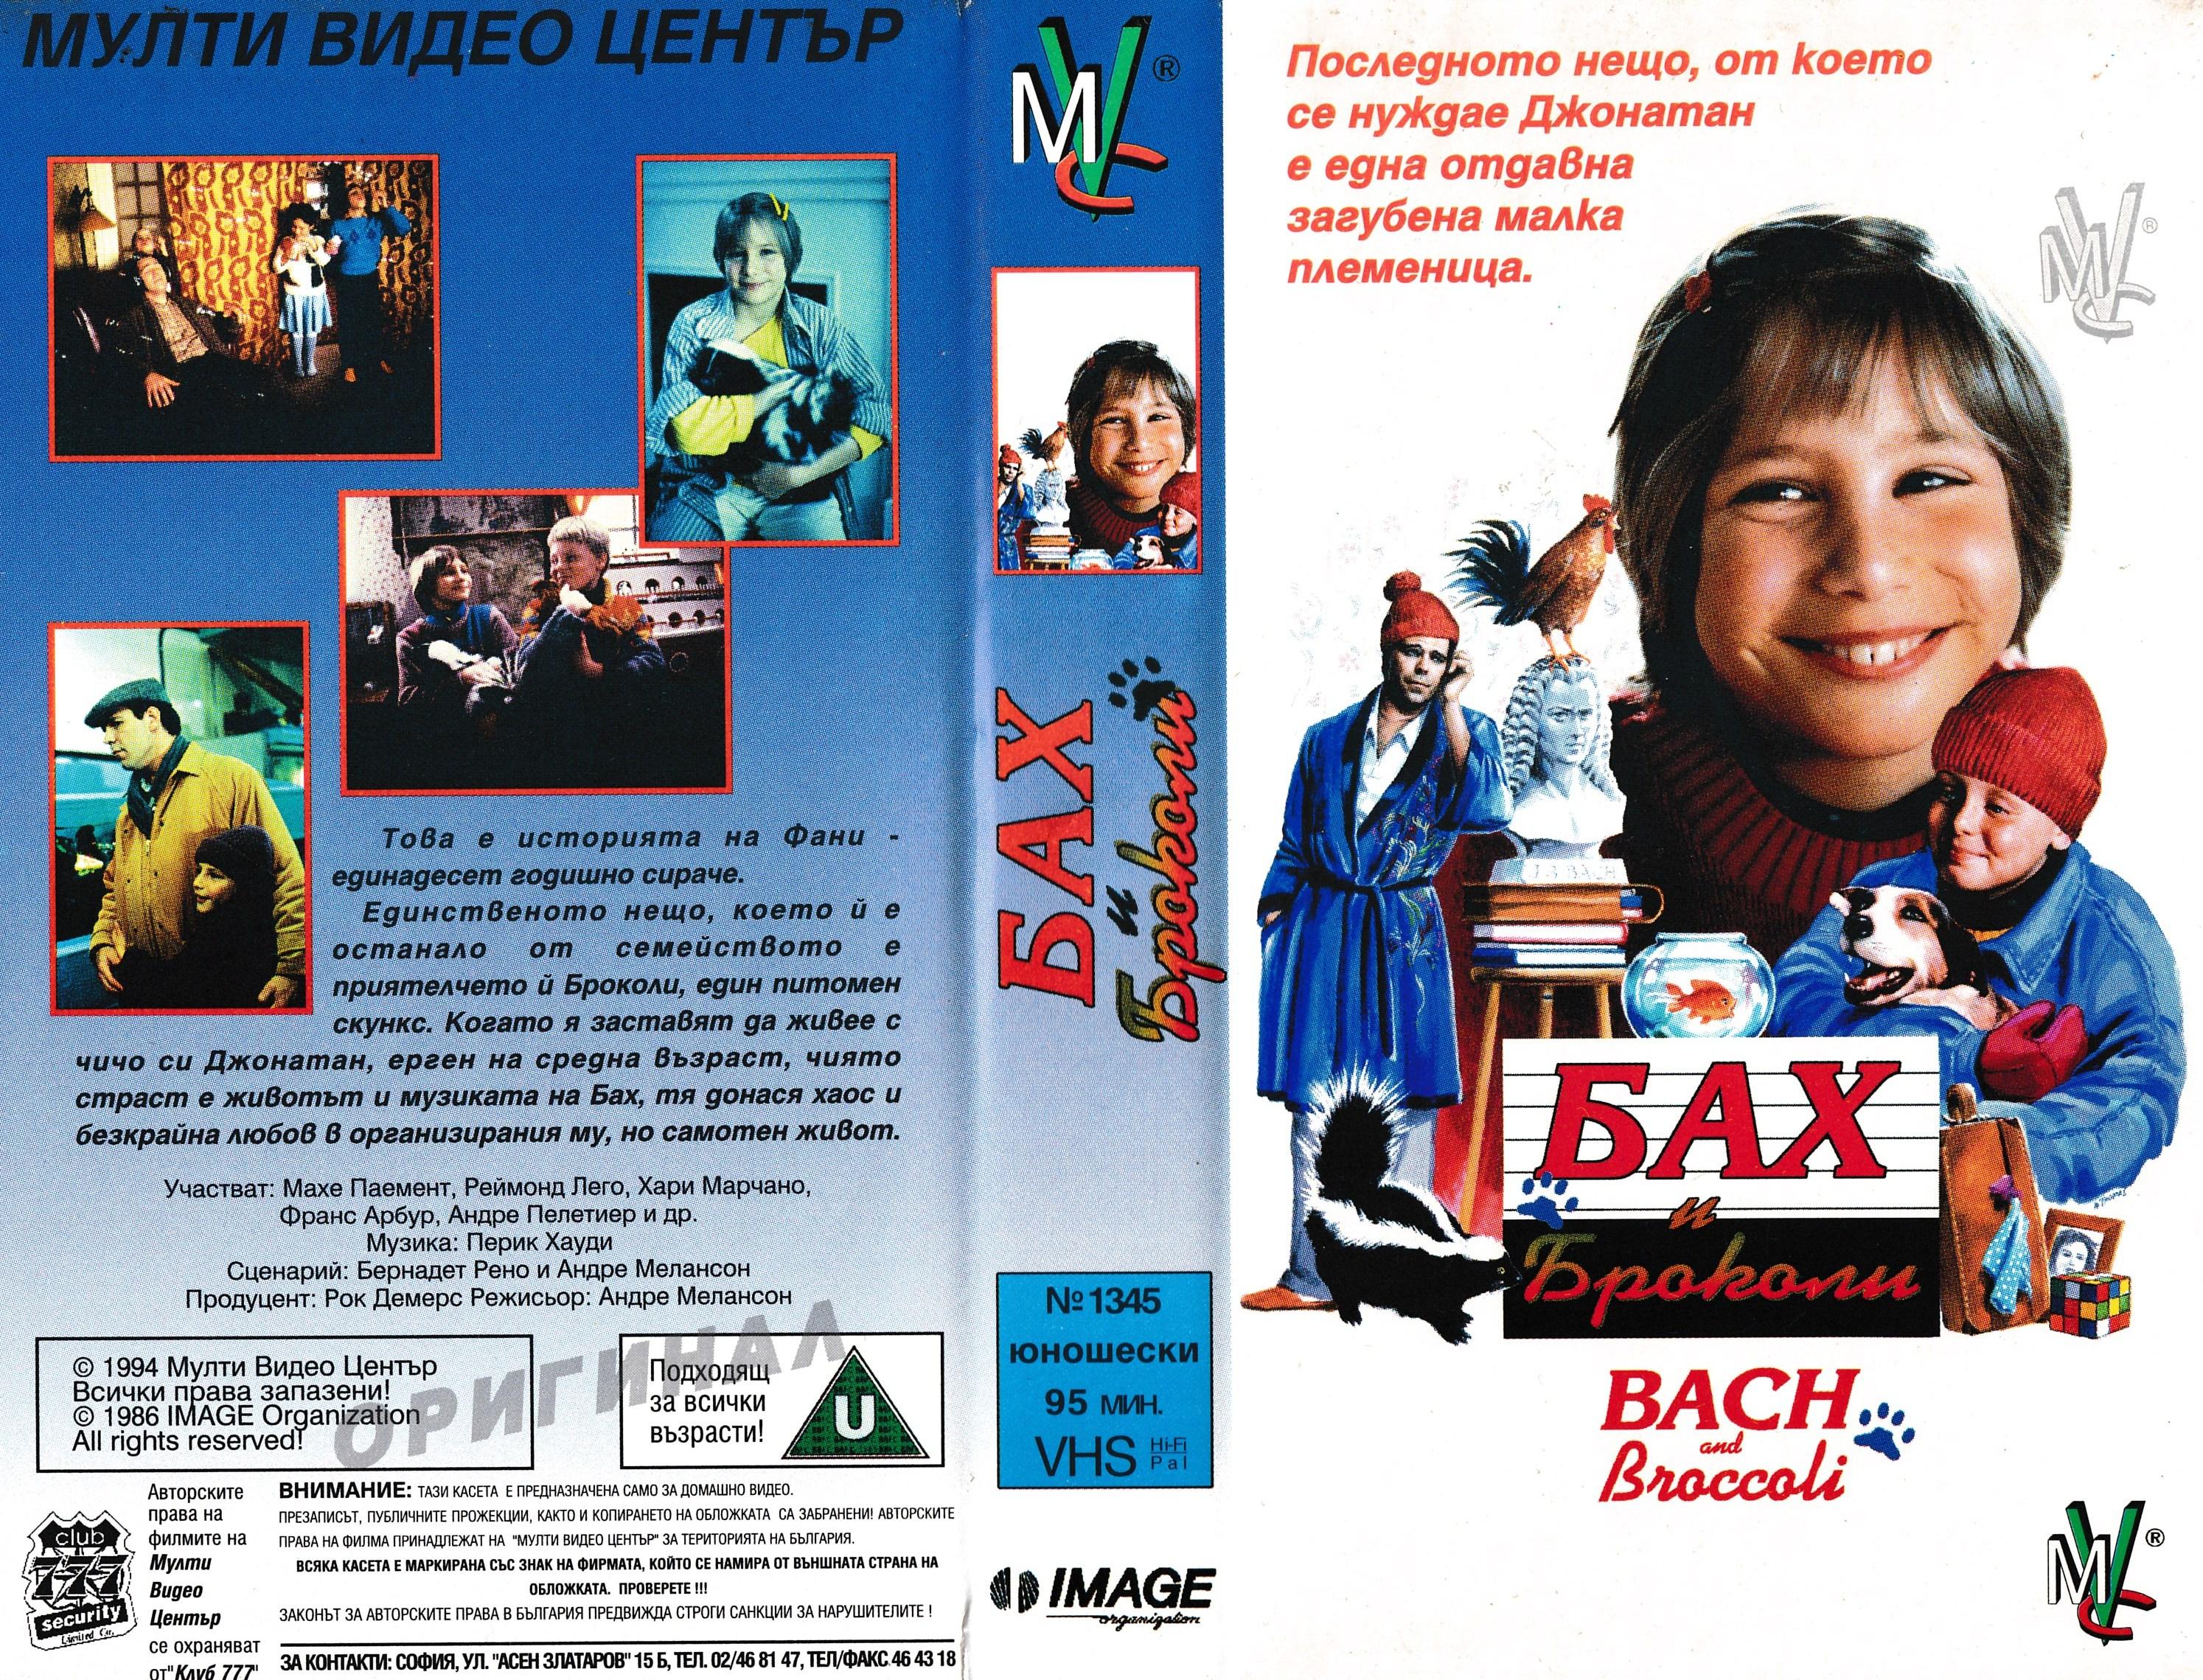 Бах и броколи филм